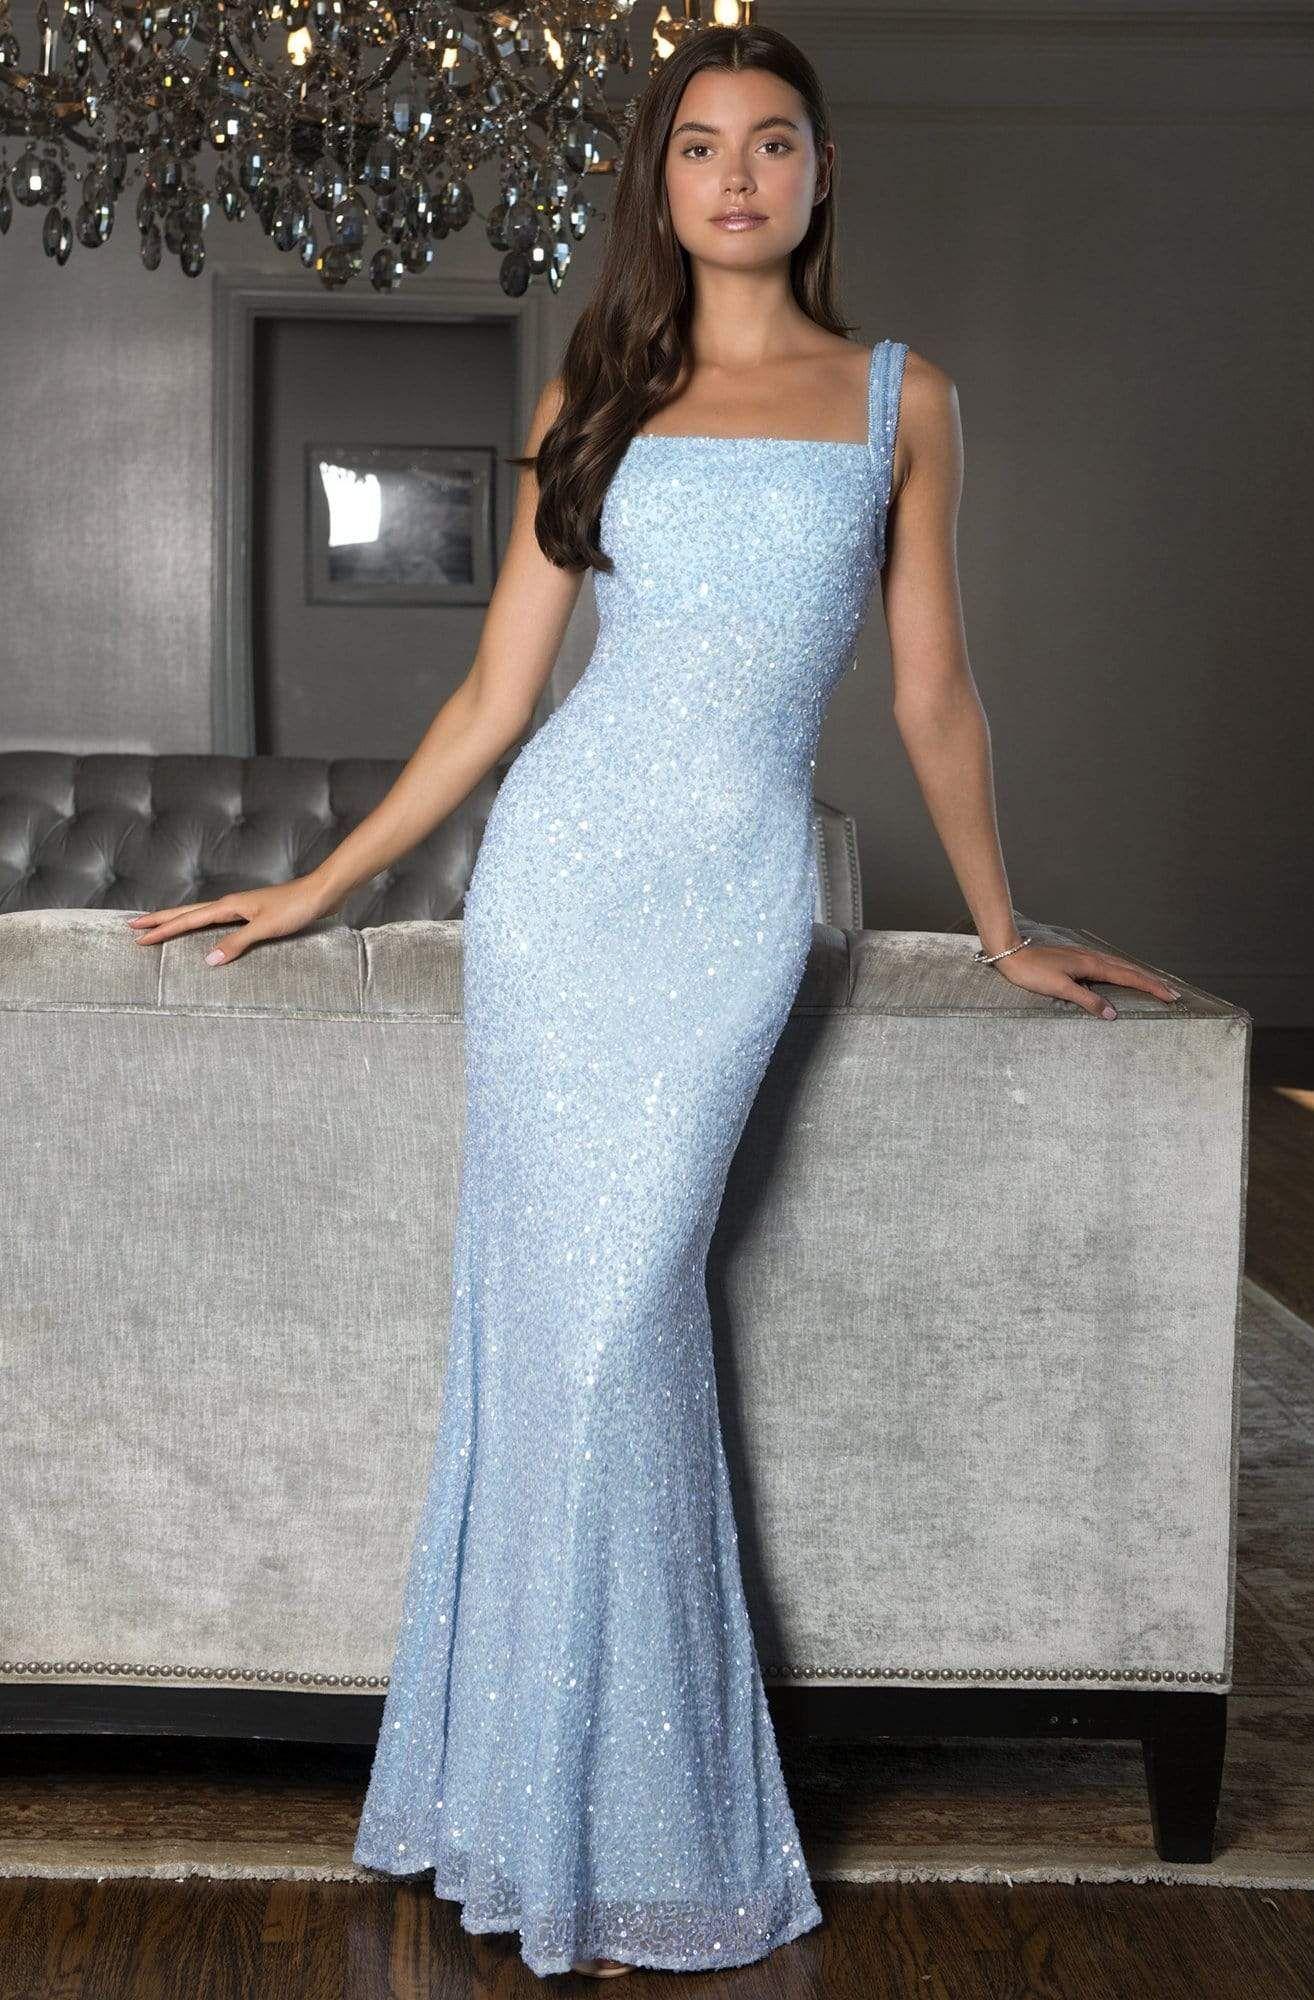 Scala 60095 Square Neck Sequin Long Sheath Dress In 2020 Dresses Square Neckline Dress Square Neck Dress [ 2000 x 1314 Pixel ]